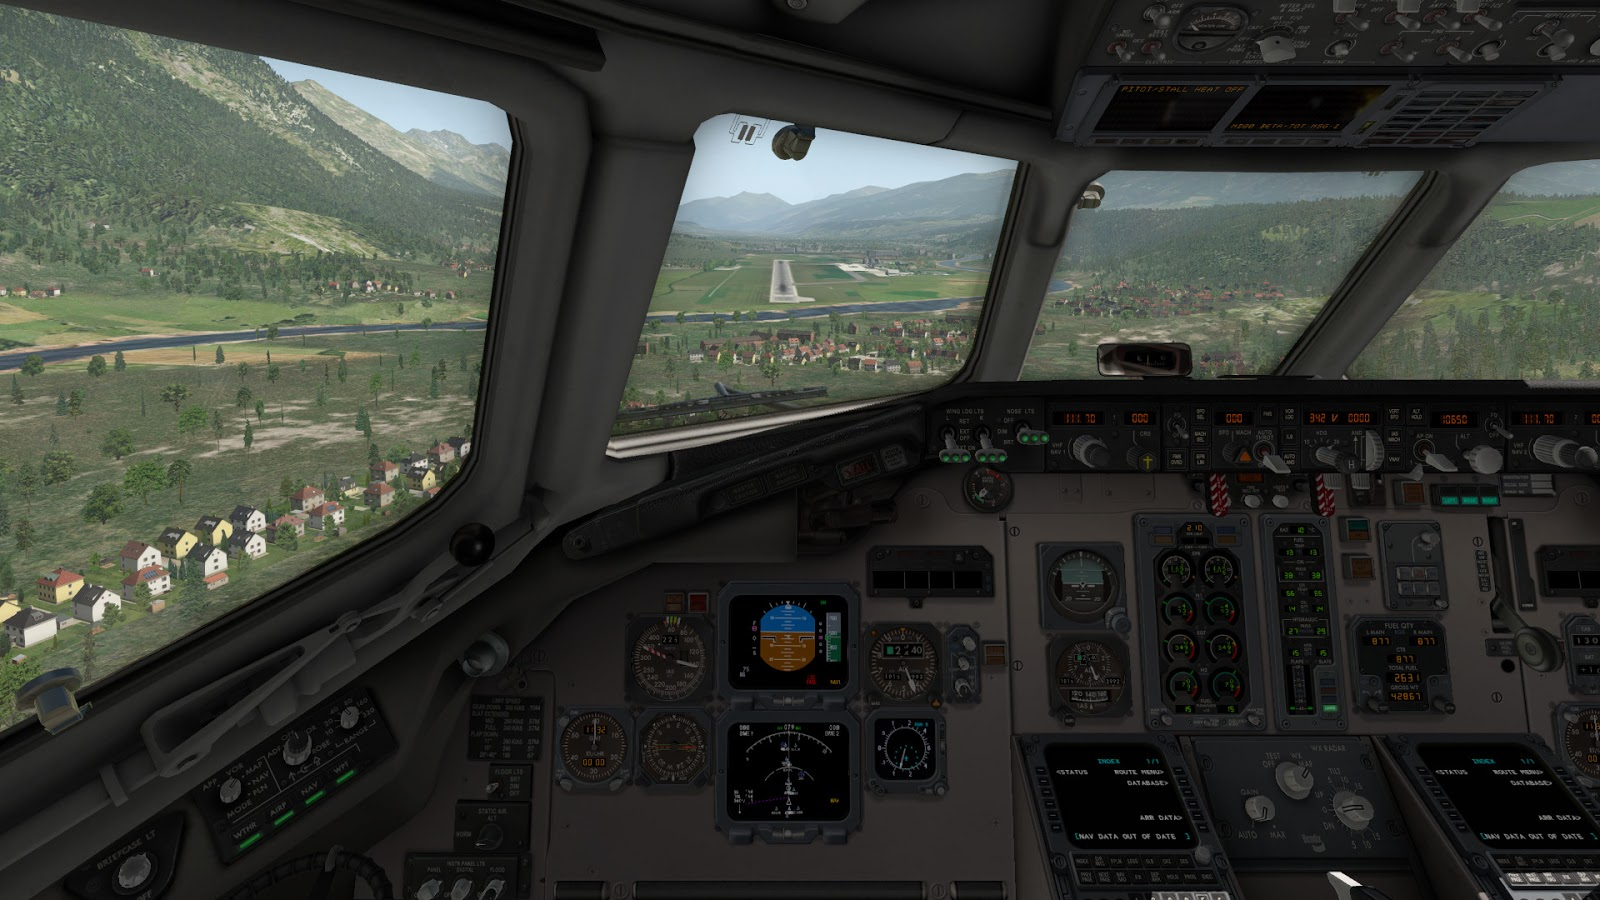 X-Plane 11 ESPAÑOL PC Full + Global Scenery DLC (CODEX) + REPACK 13 DVD5 (JPW) 6